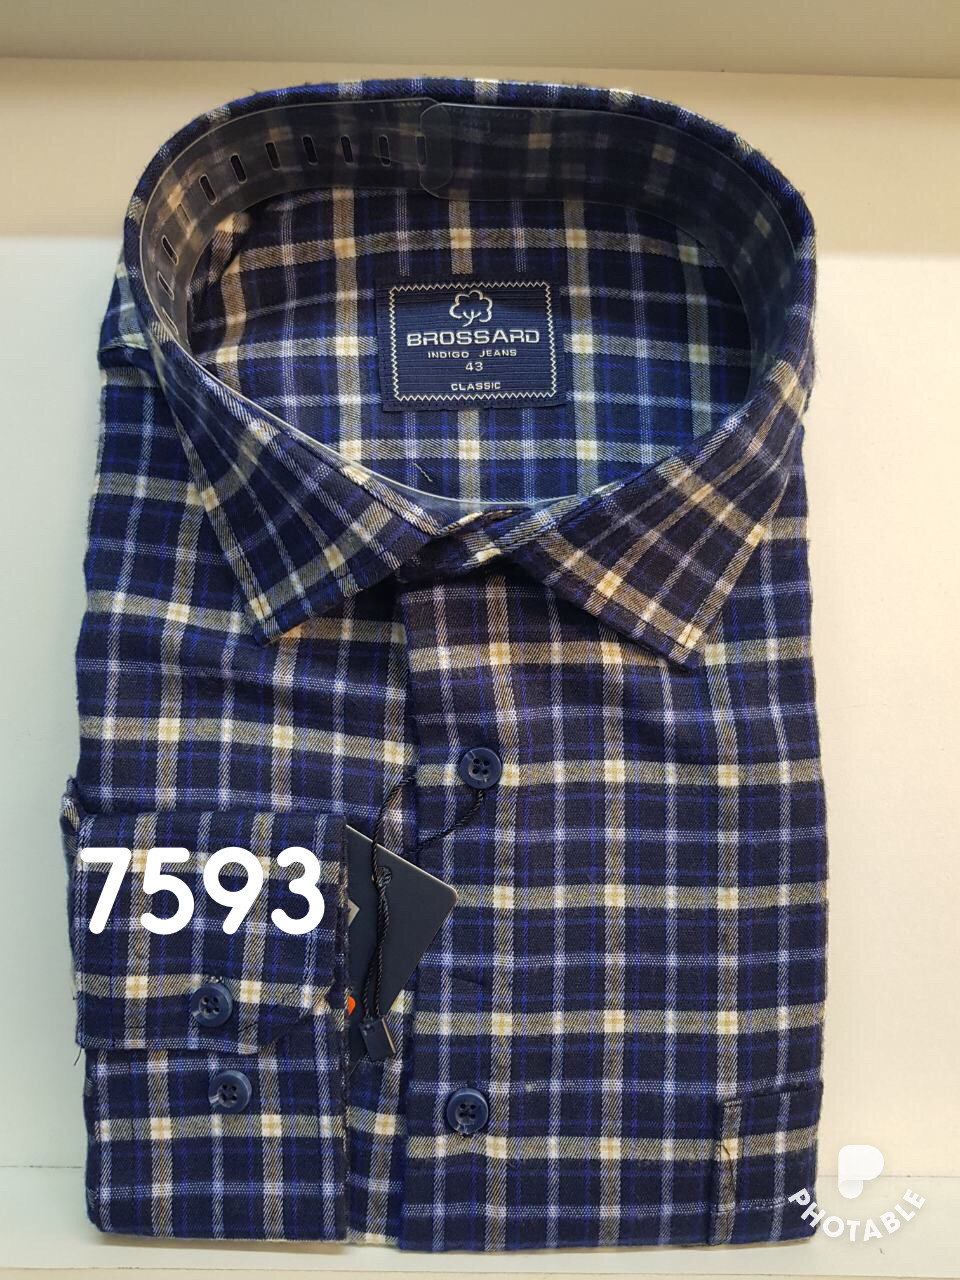 Мужская рубашка кашемир Brossard-7593